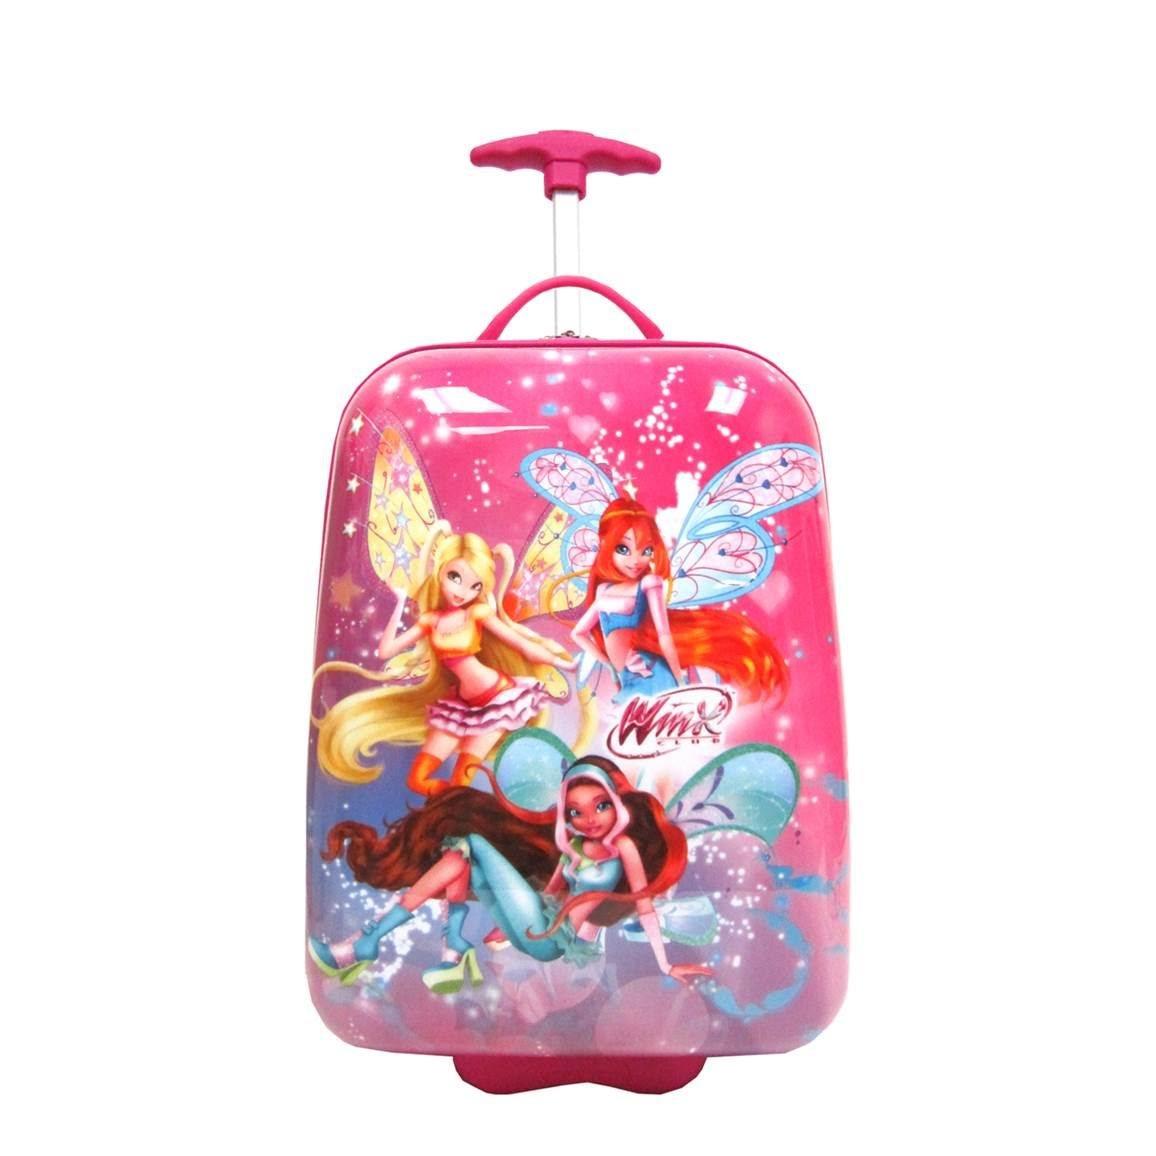 Disney Winx Club 16'' Hard Side 2-Wheeled Kids Luggage - Multi-colour